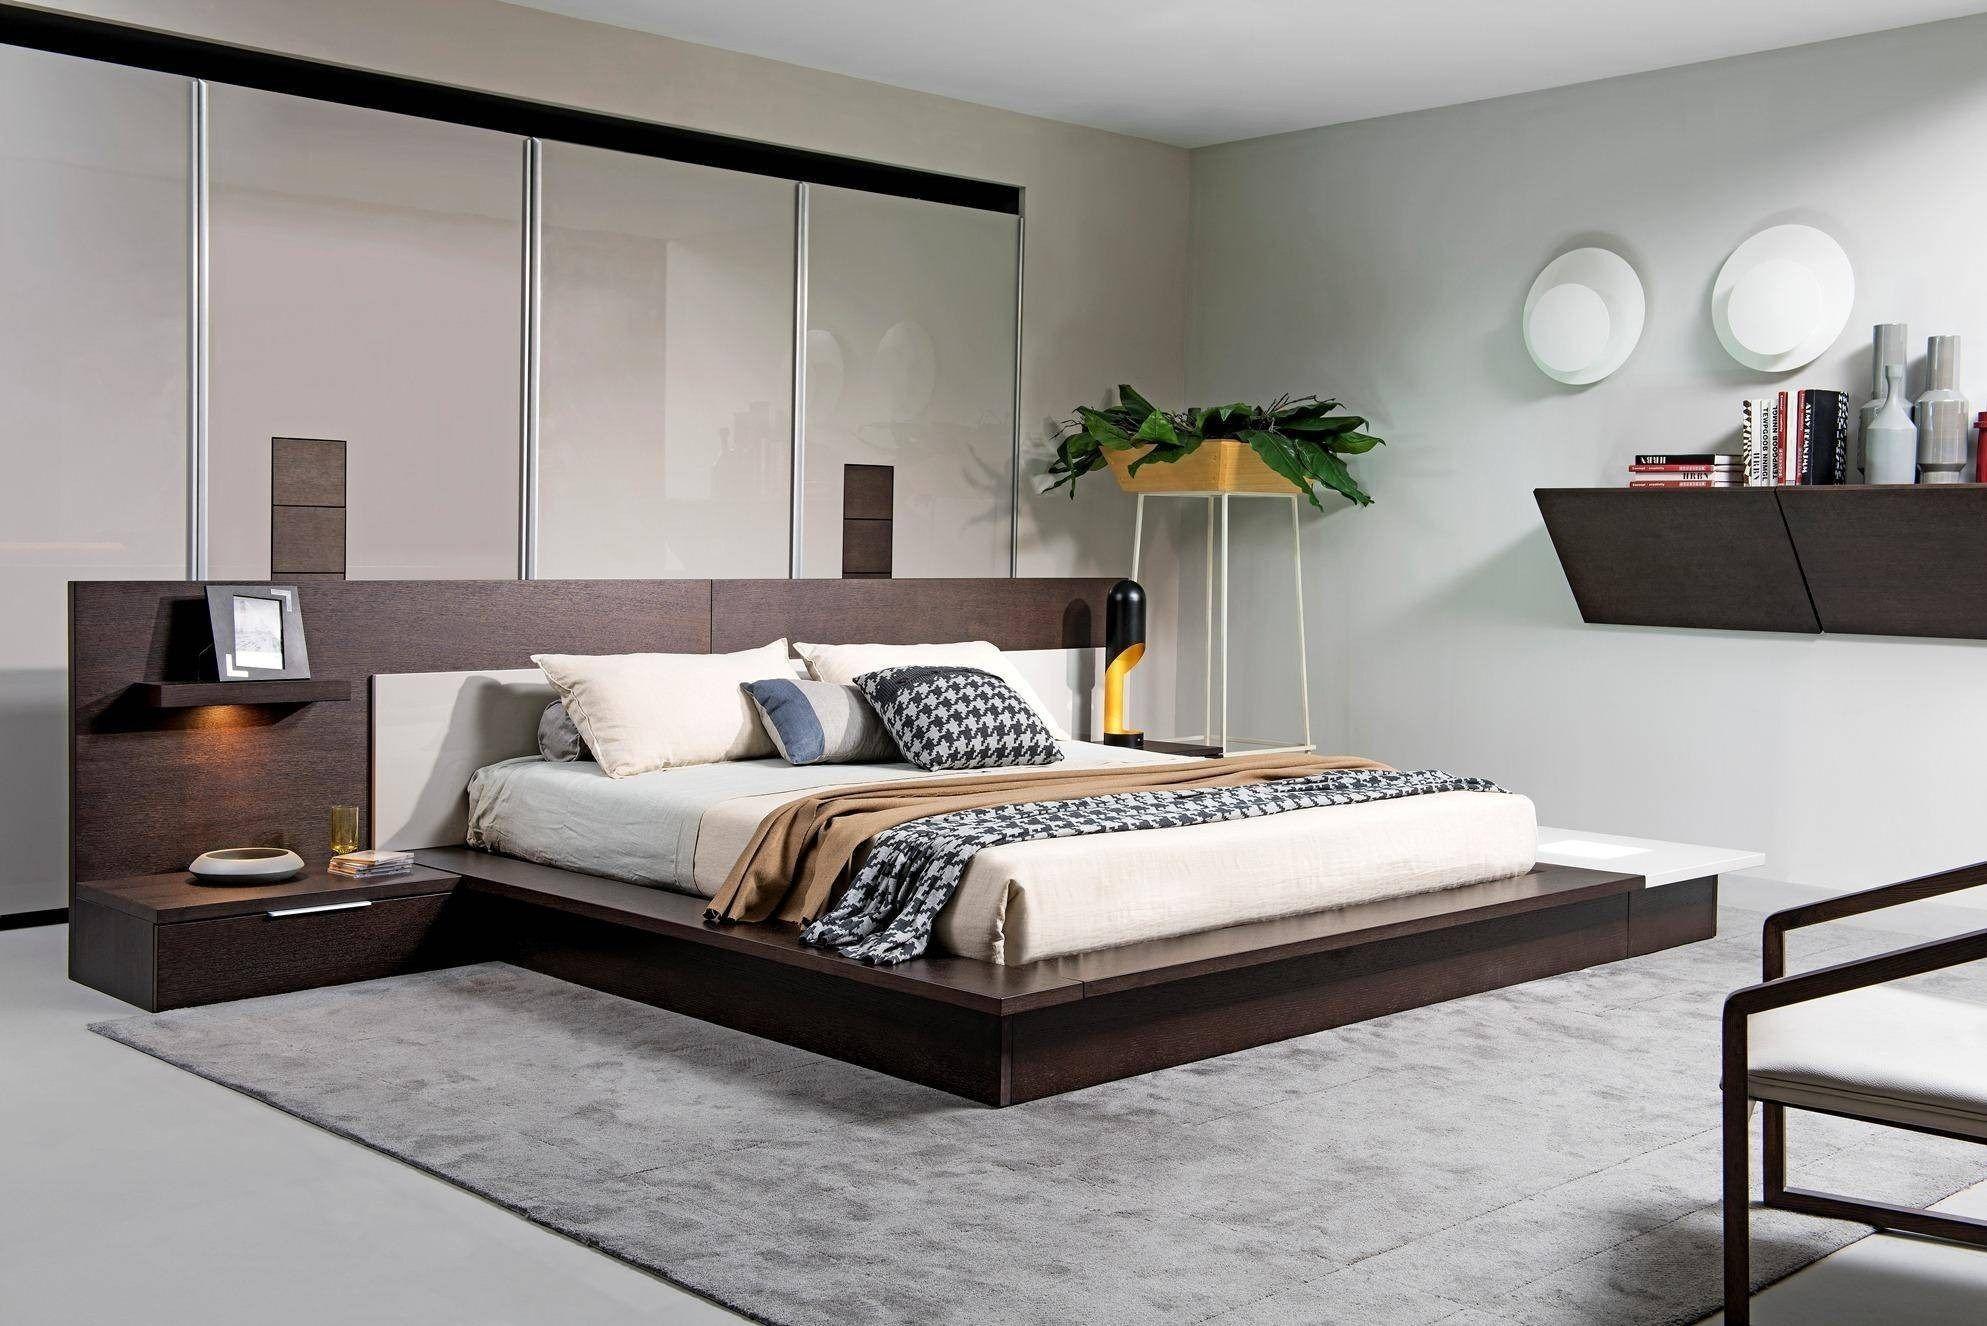 Pin Oleh Home Design Inspiration Di Bedroom Decorating Ideas